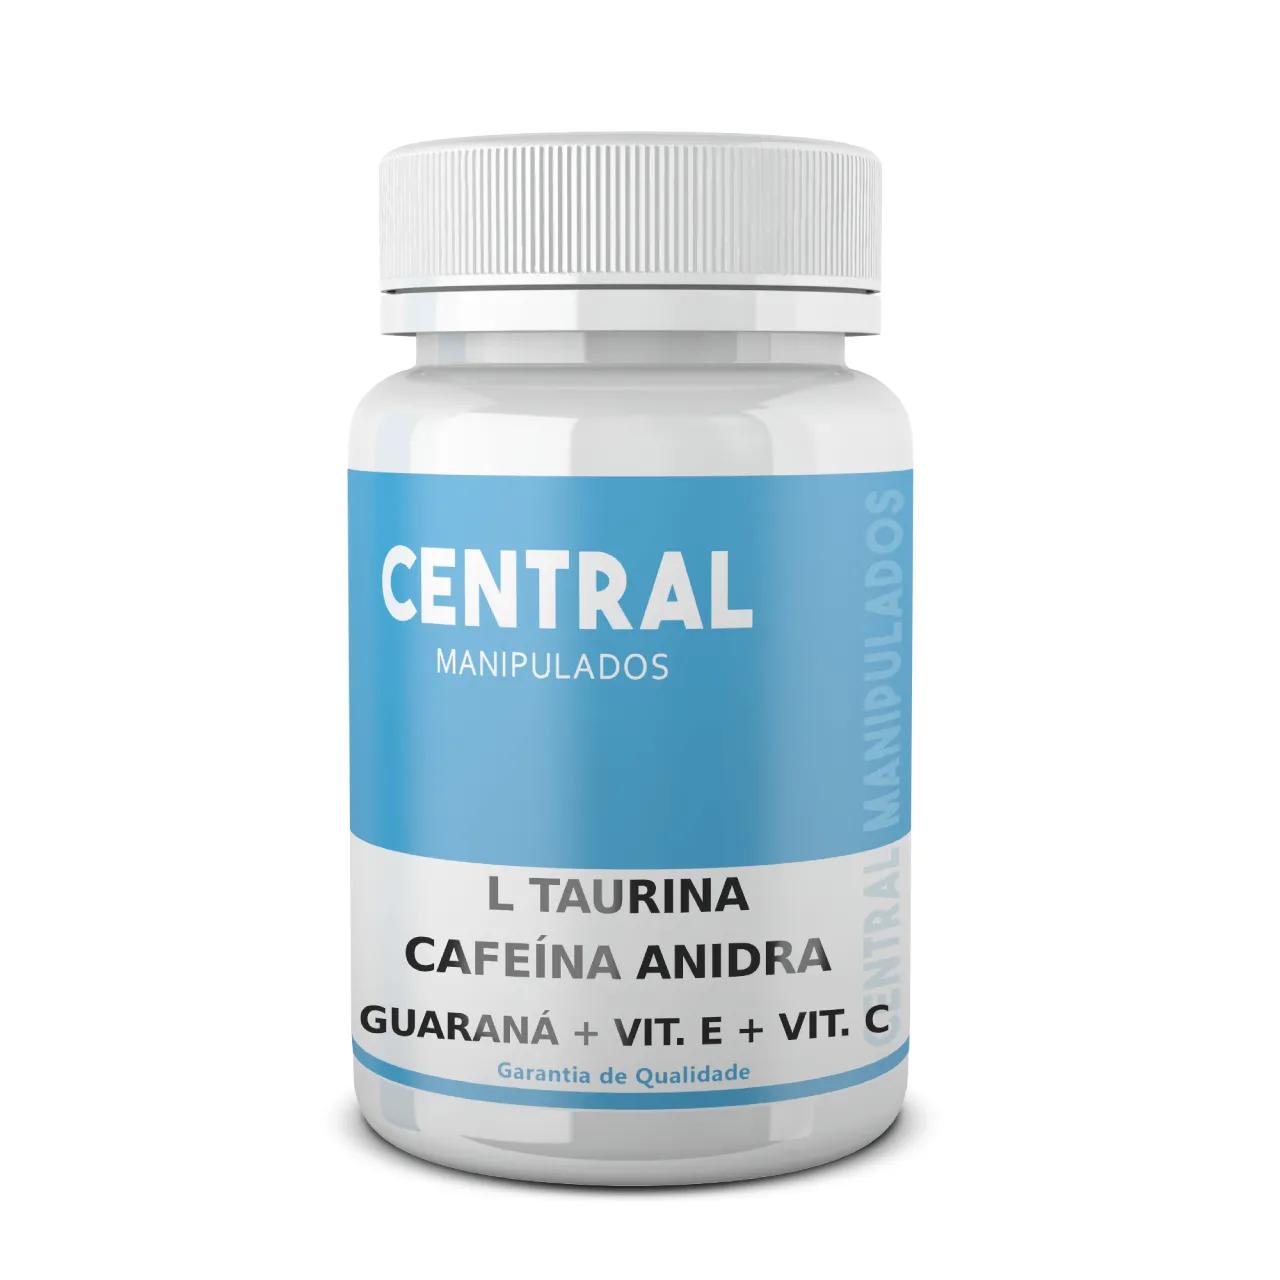 L Taurina 150mg  + Cafeína Anidra 60mg + Guaraná 100mg + Vit E 30mg + Vit C 50mg - Energia e Disposição - 120 cápsulas